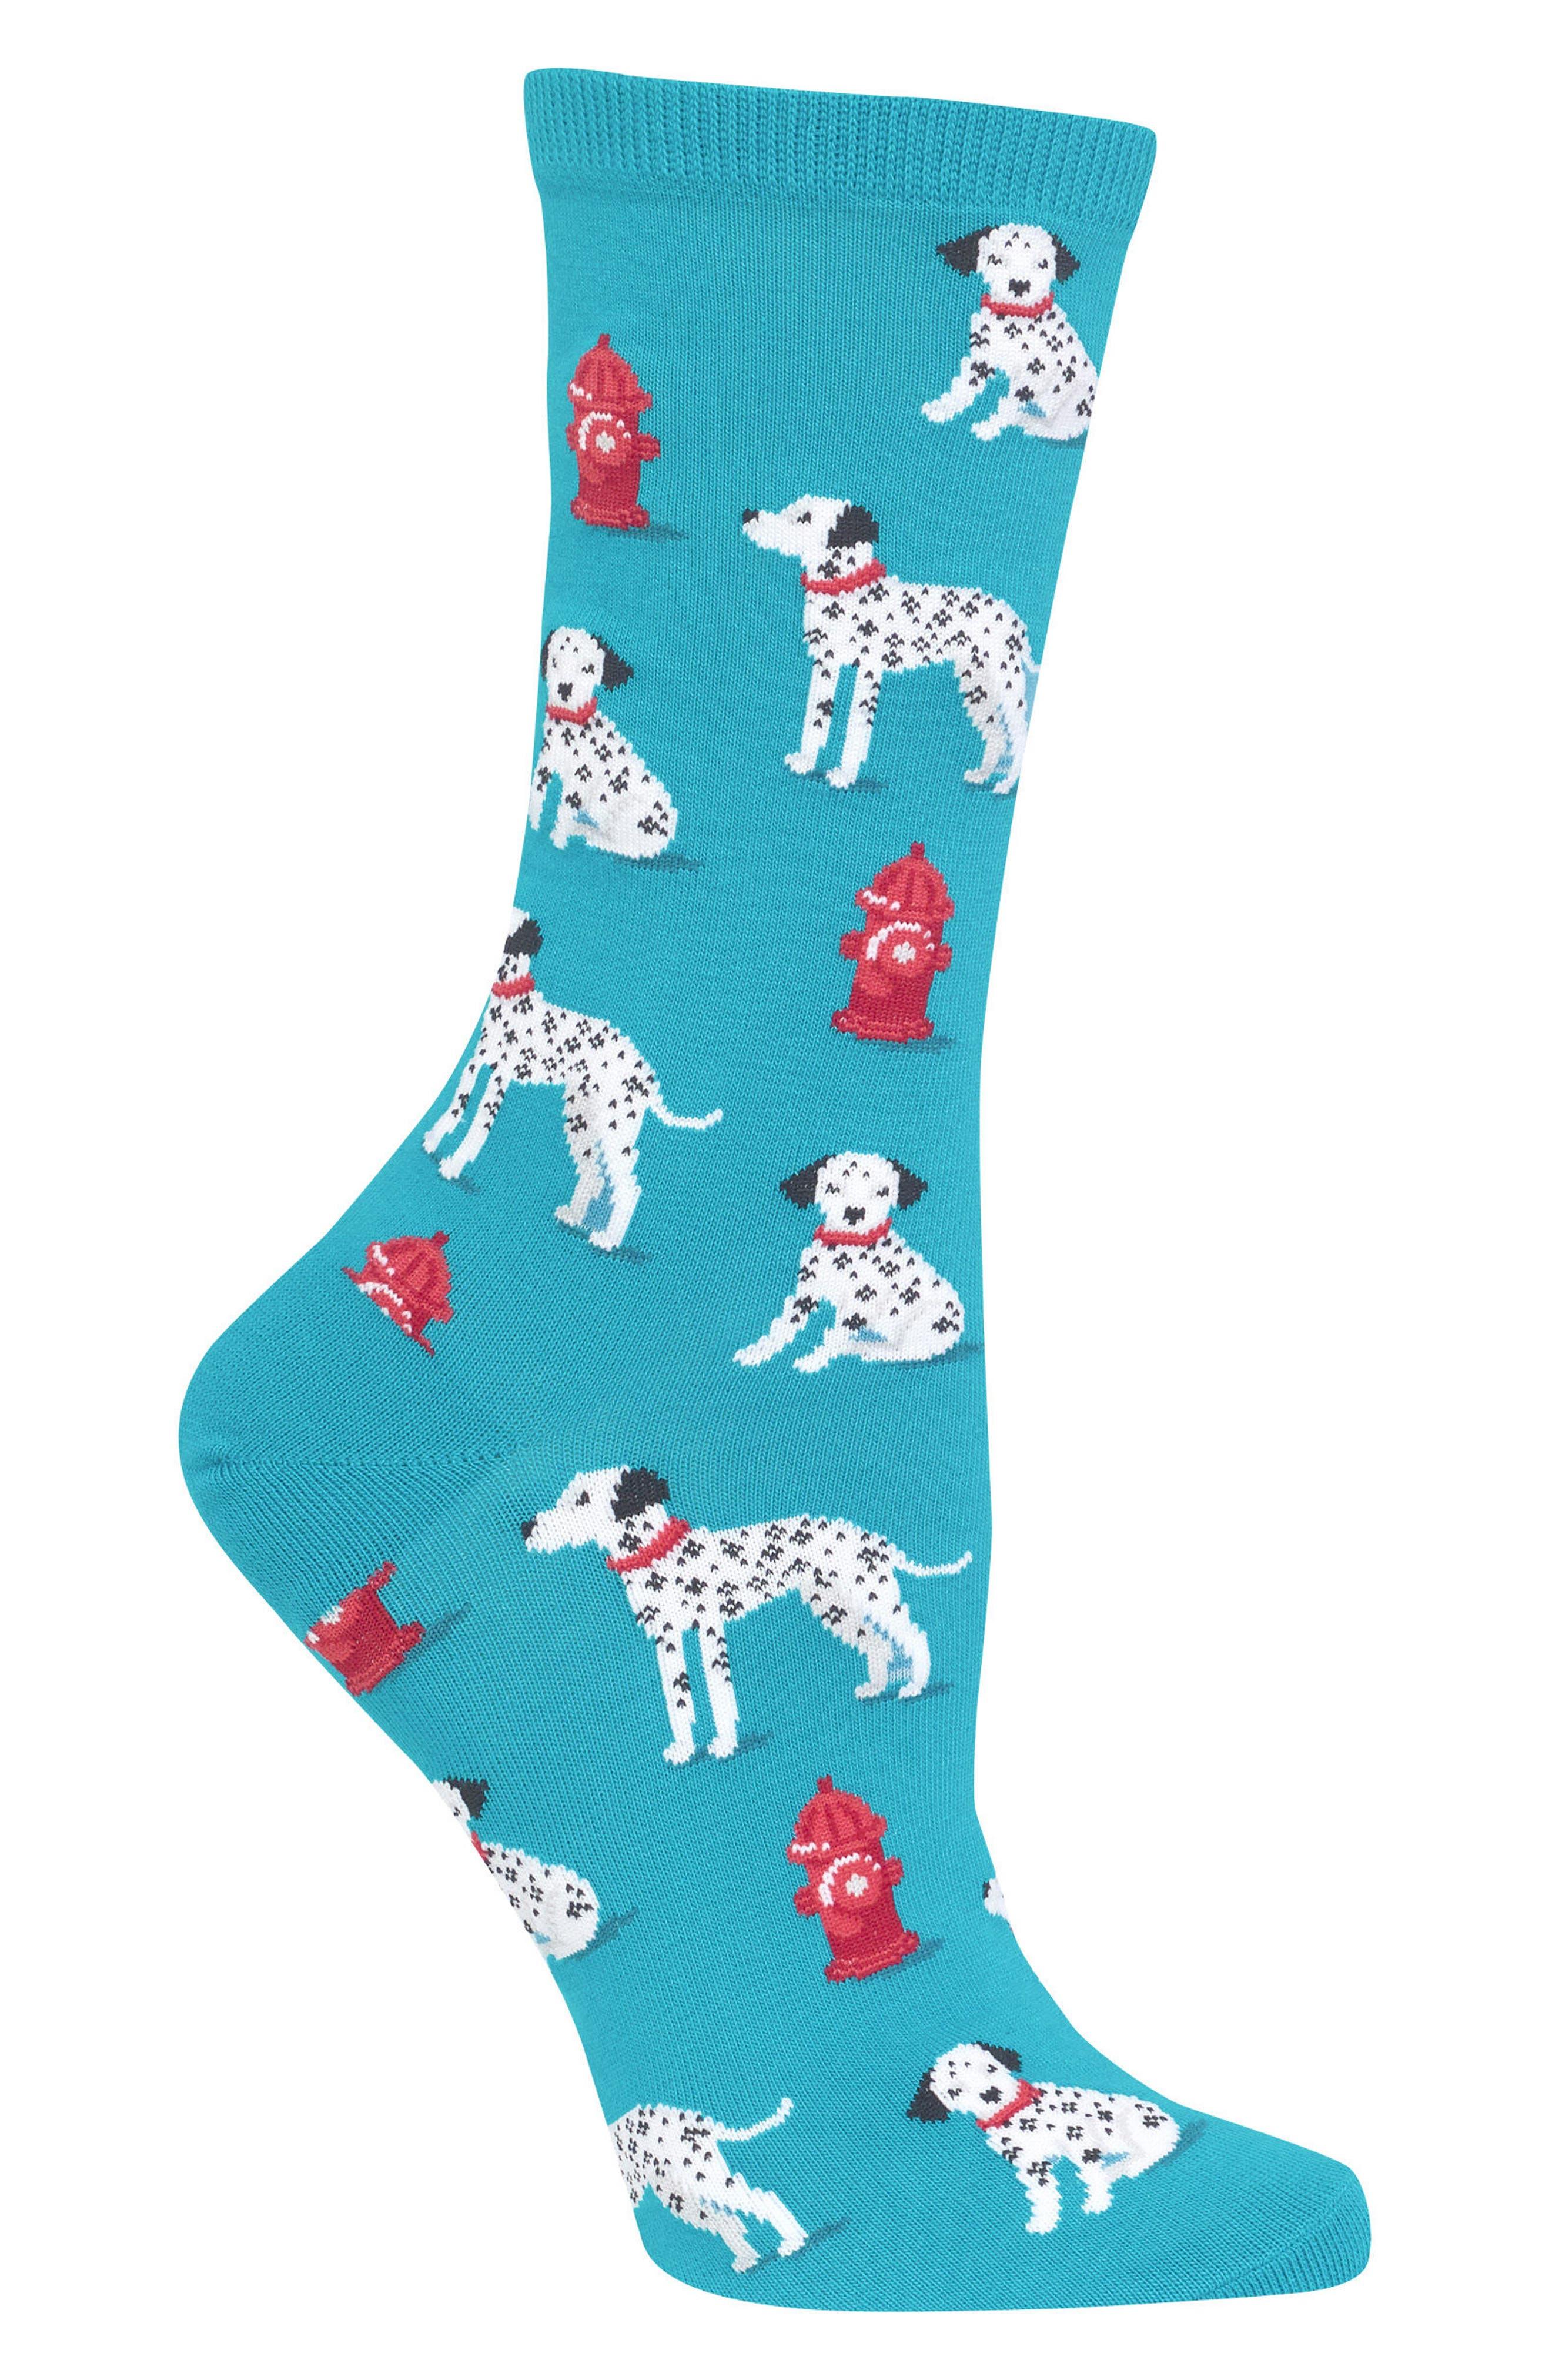 Dalmatian Crew Socks,                             Alternate thumbnail 2, color,                             441